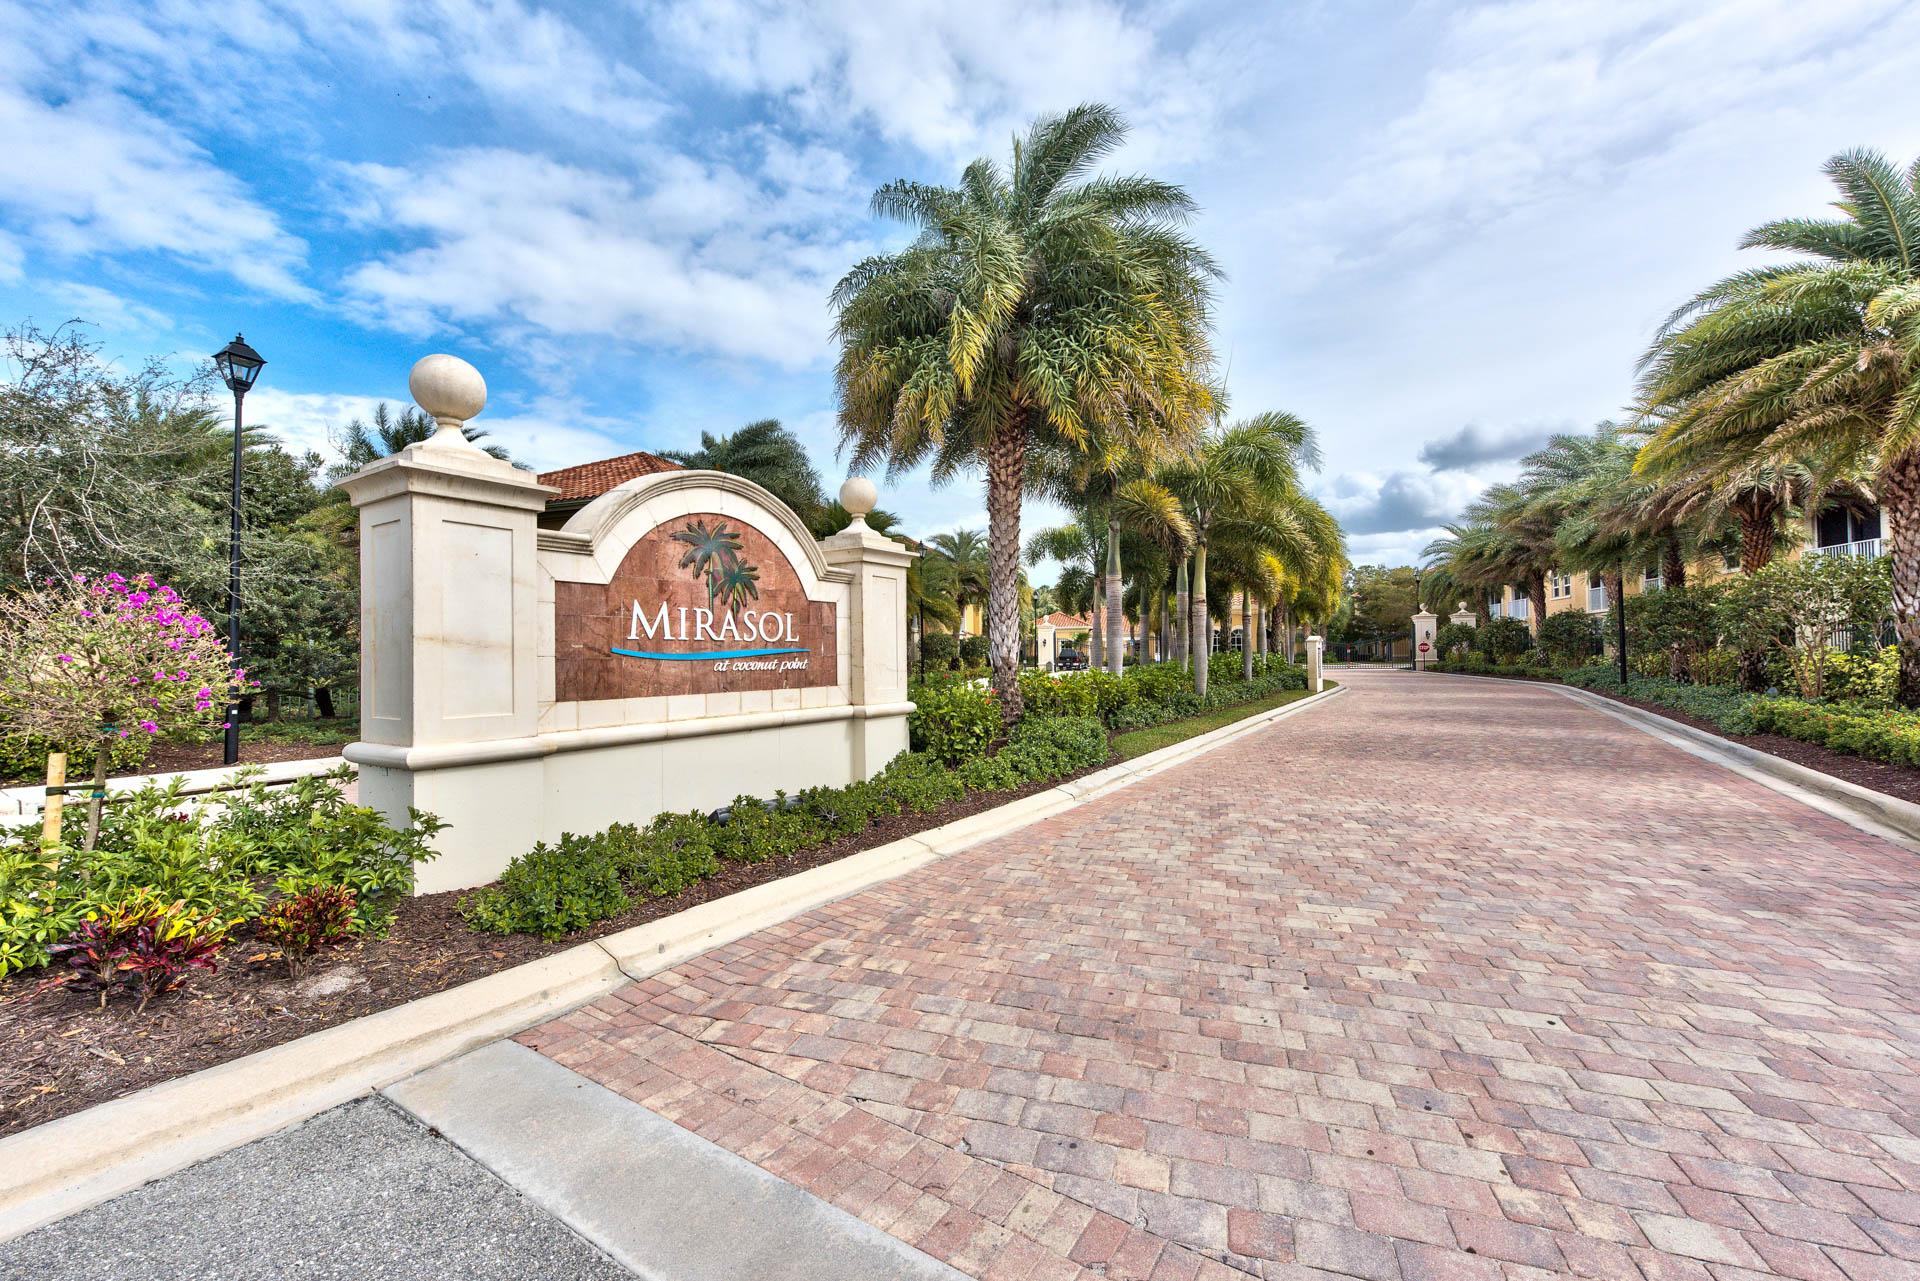 Mirasol-Front-Gate-Entrance-Estero-FL